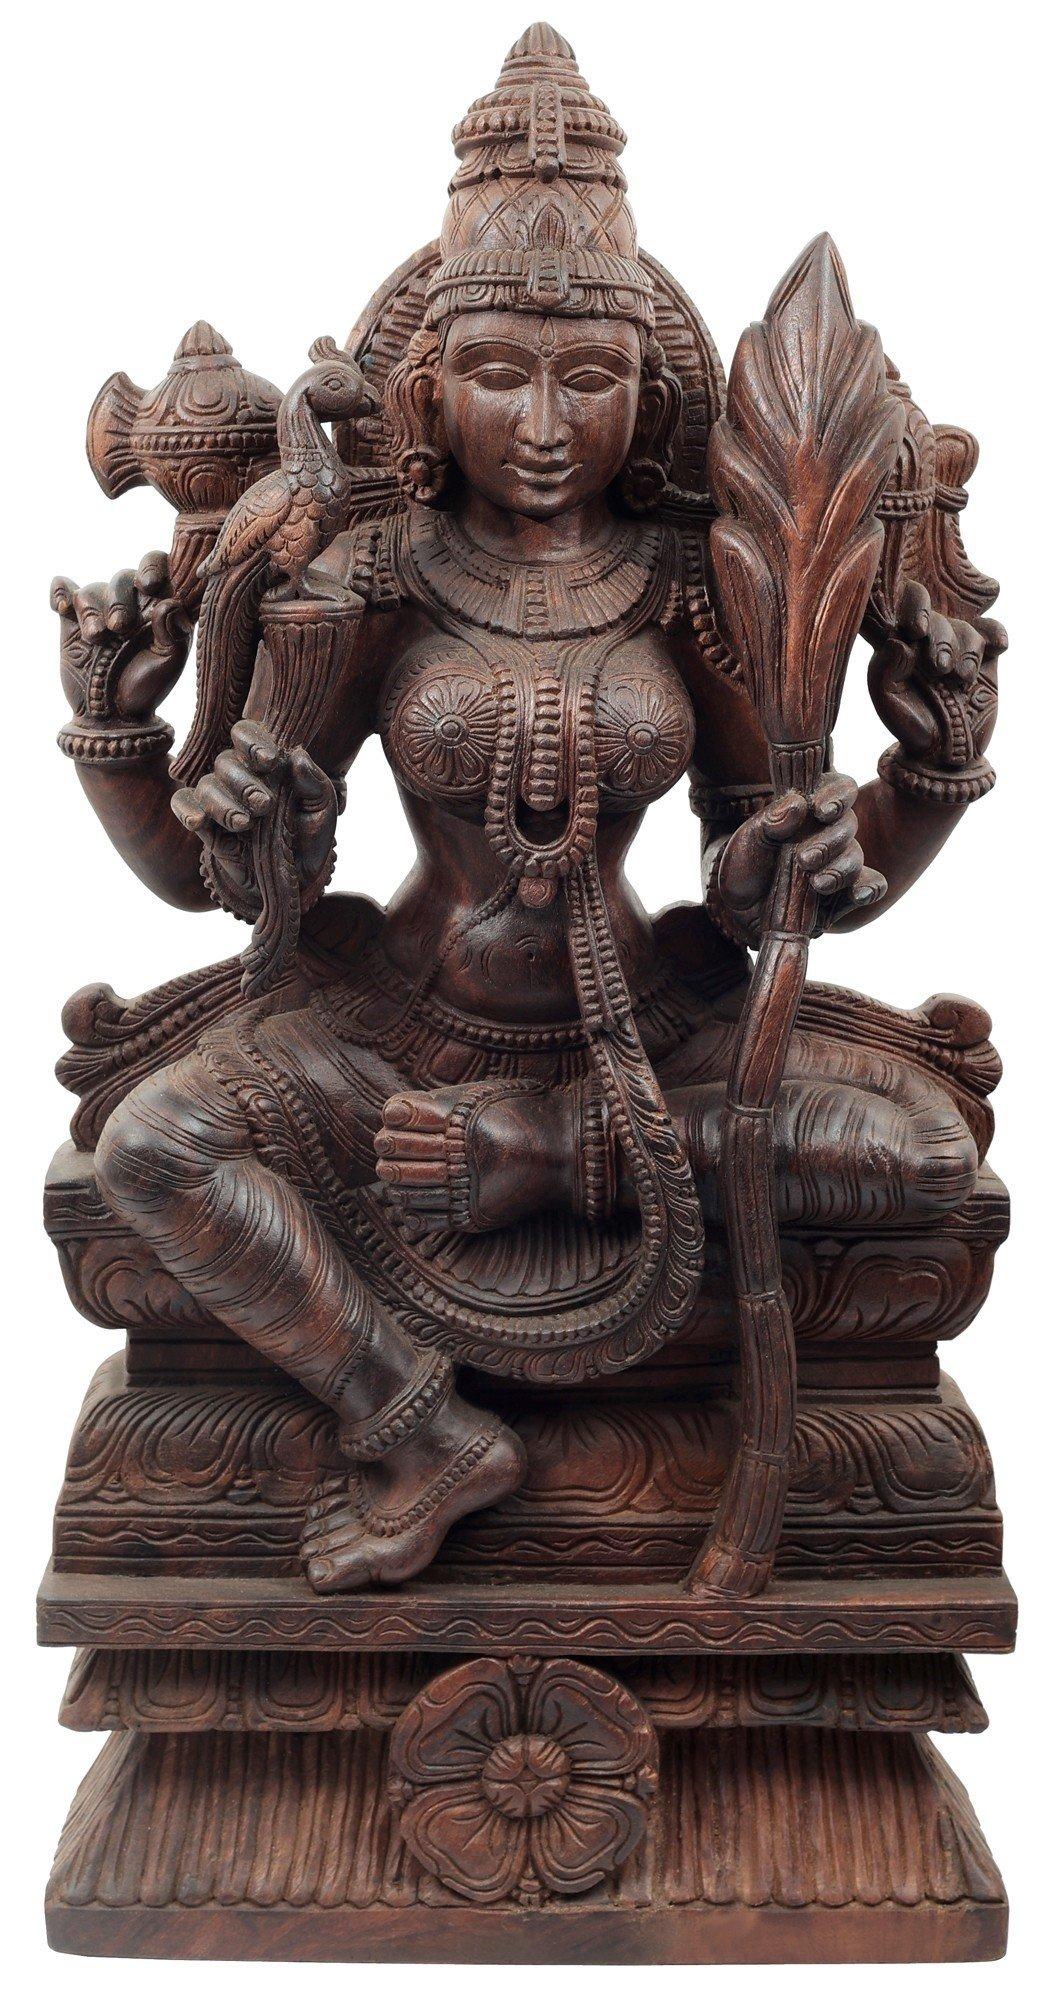 Rajarajeshwari (Lalita) – Empress of Desire, Beauty and Wisdom